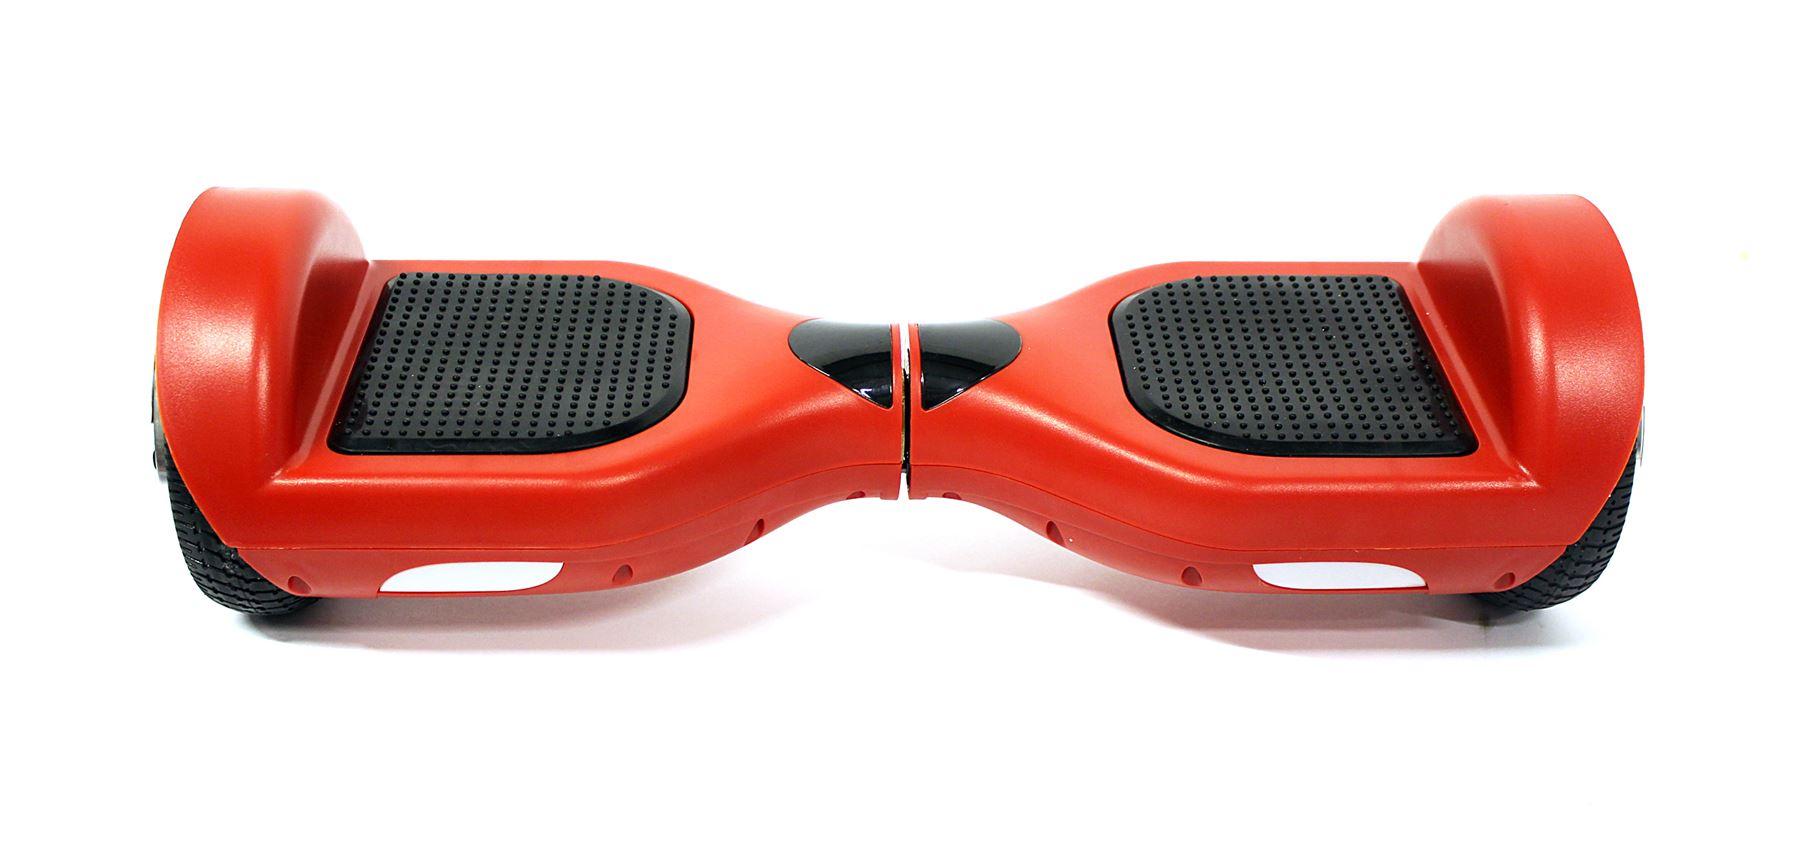 smart 2 wheel balance board remote bluetooth led electric scooter hoverboard 8 ebay. Black Bedroom Furniture Sets. Home Design Ideas